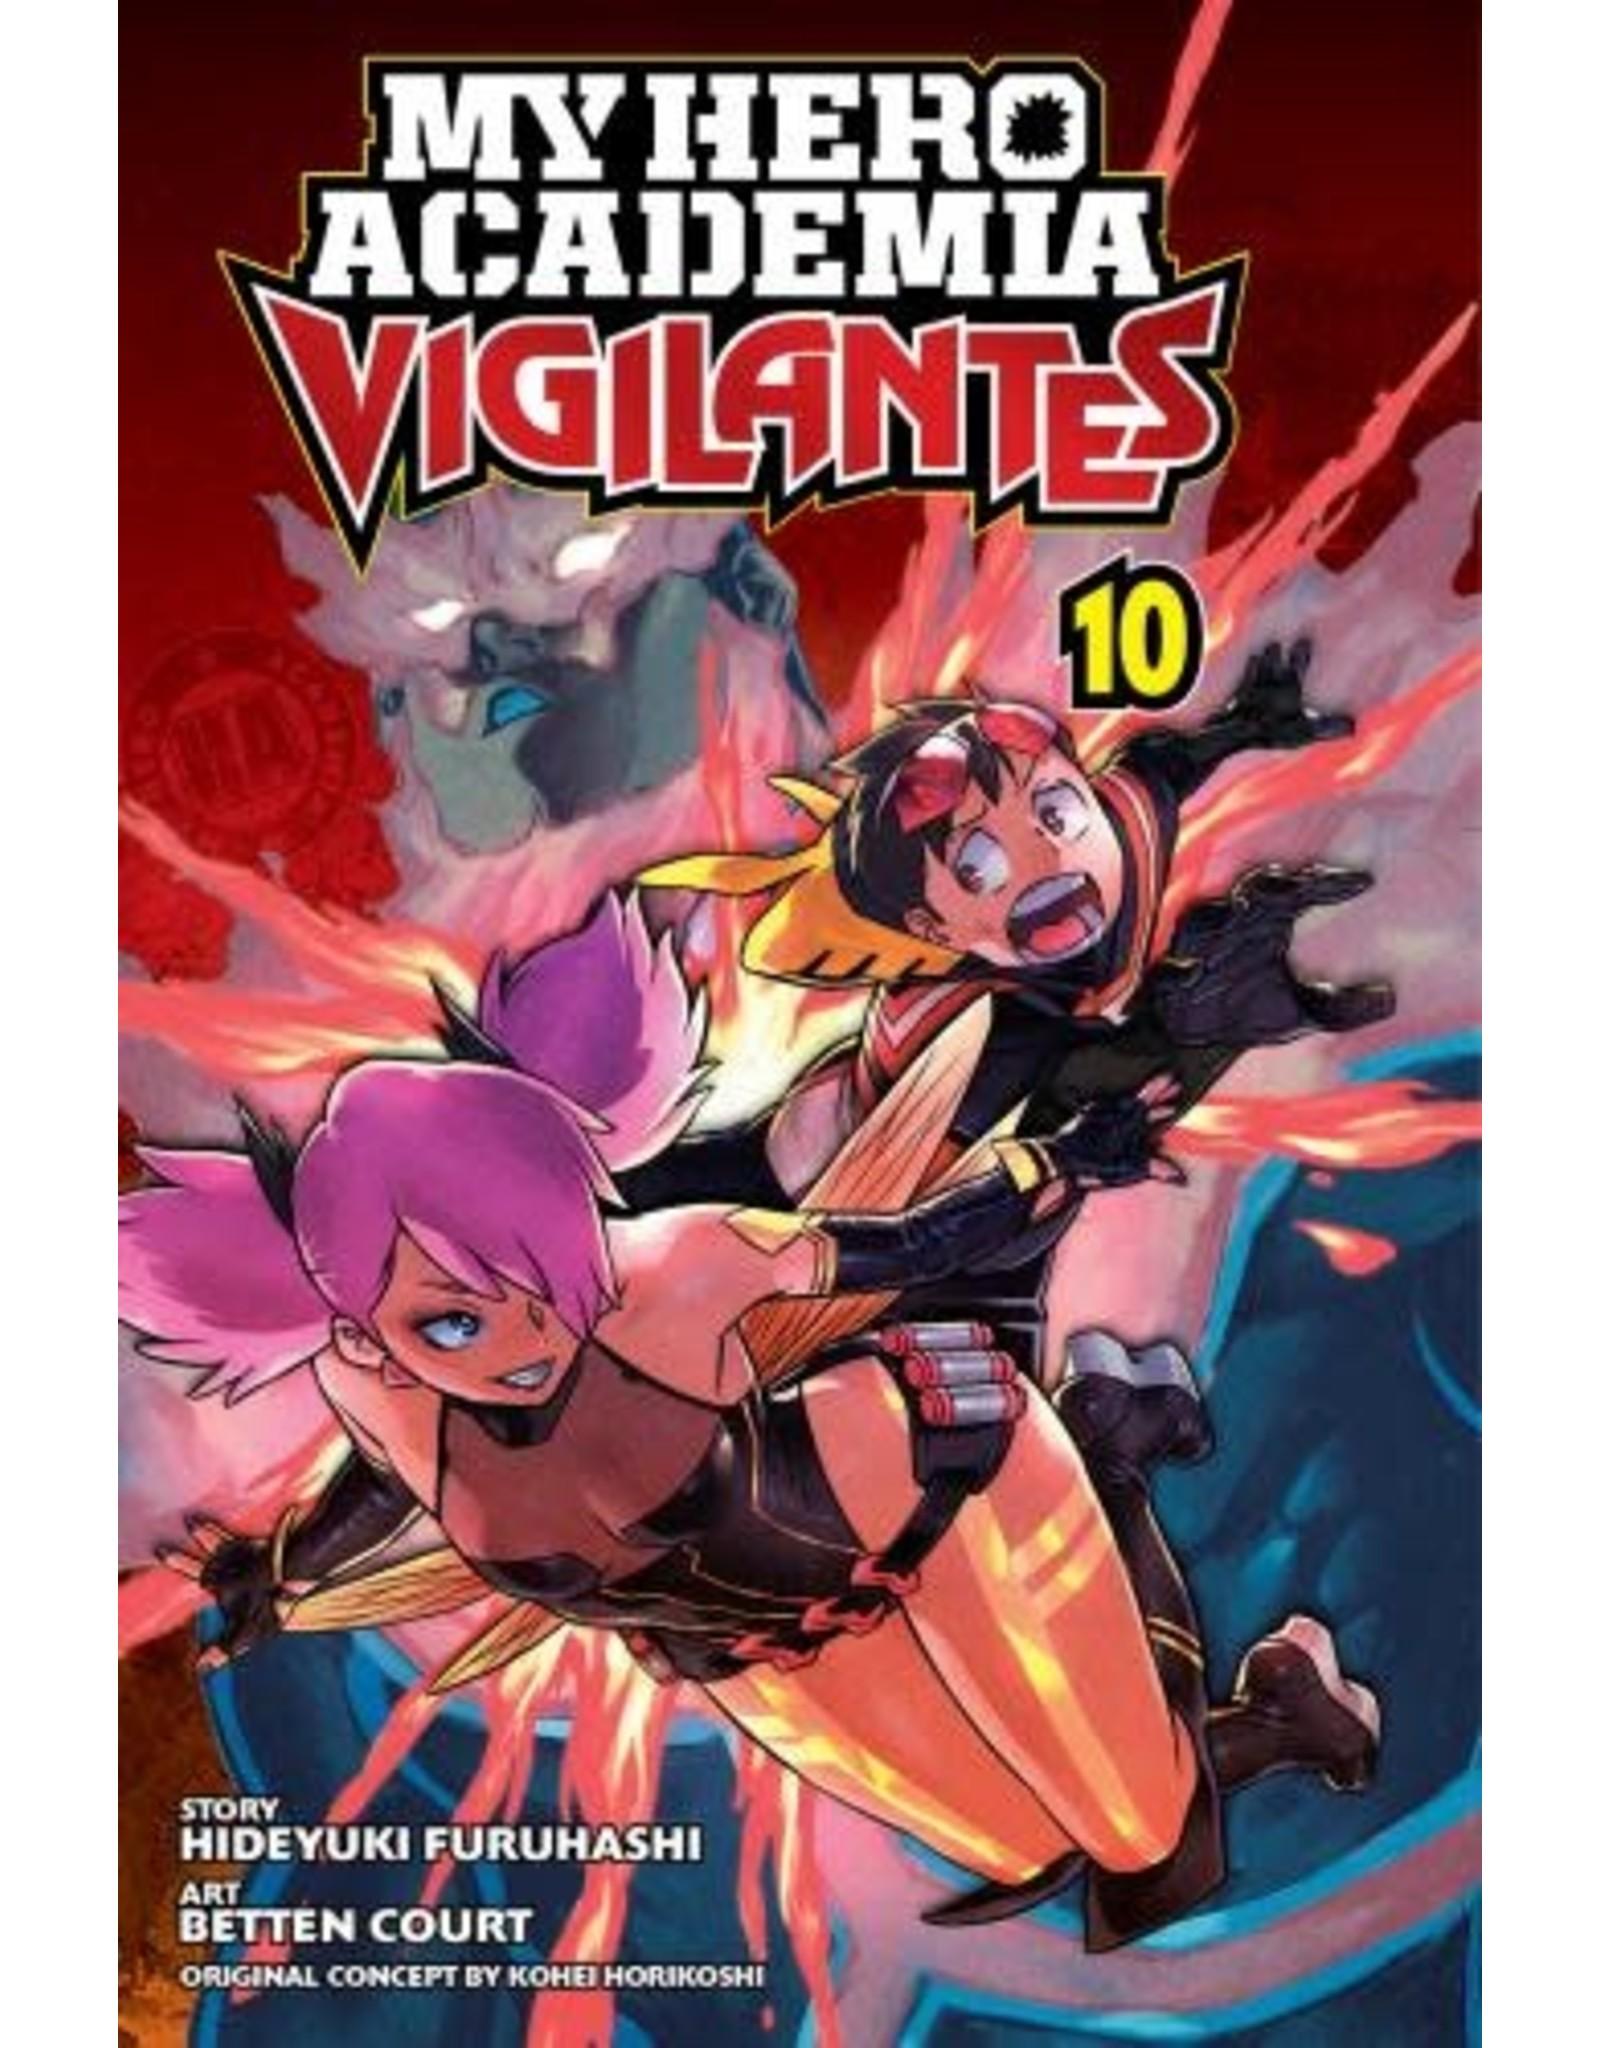 My Hero Academia: Vigilantes 10 (English) - Manga